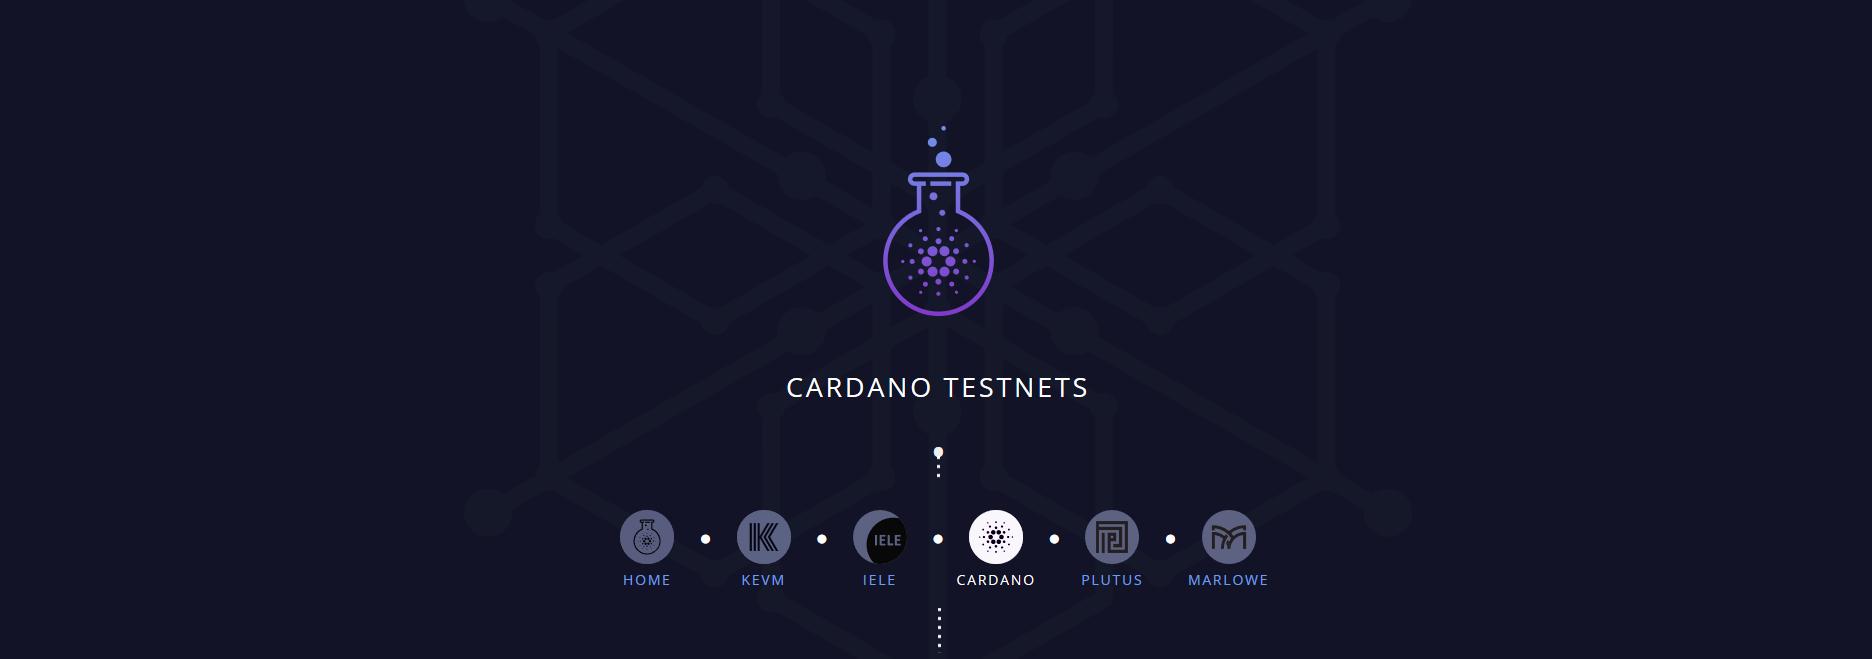 Cardano Testnets